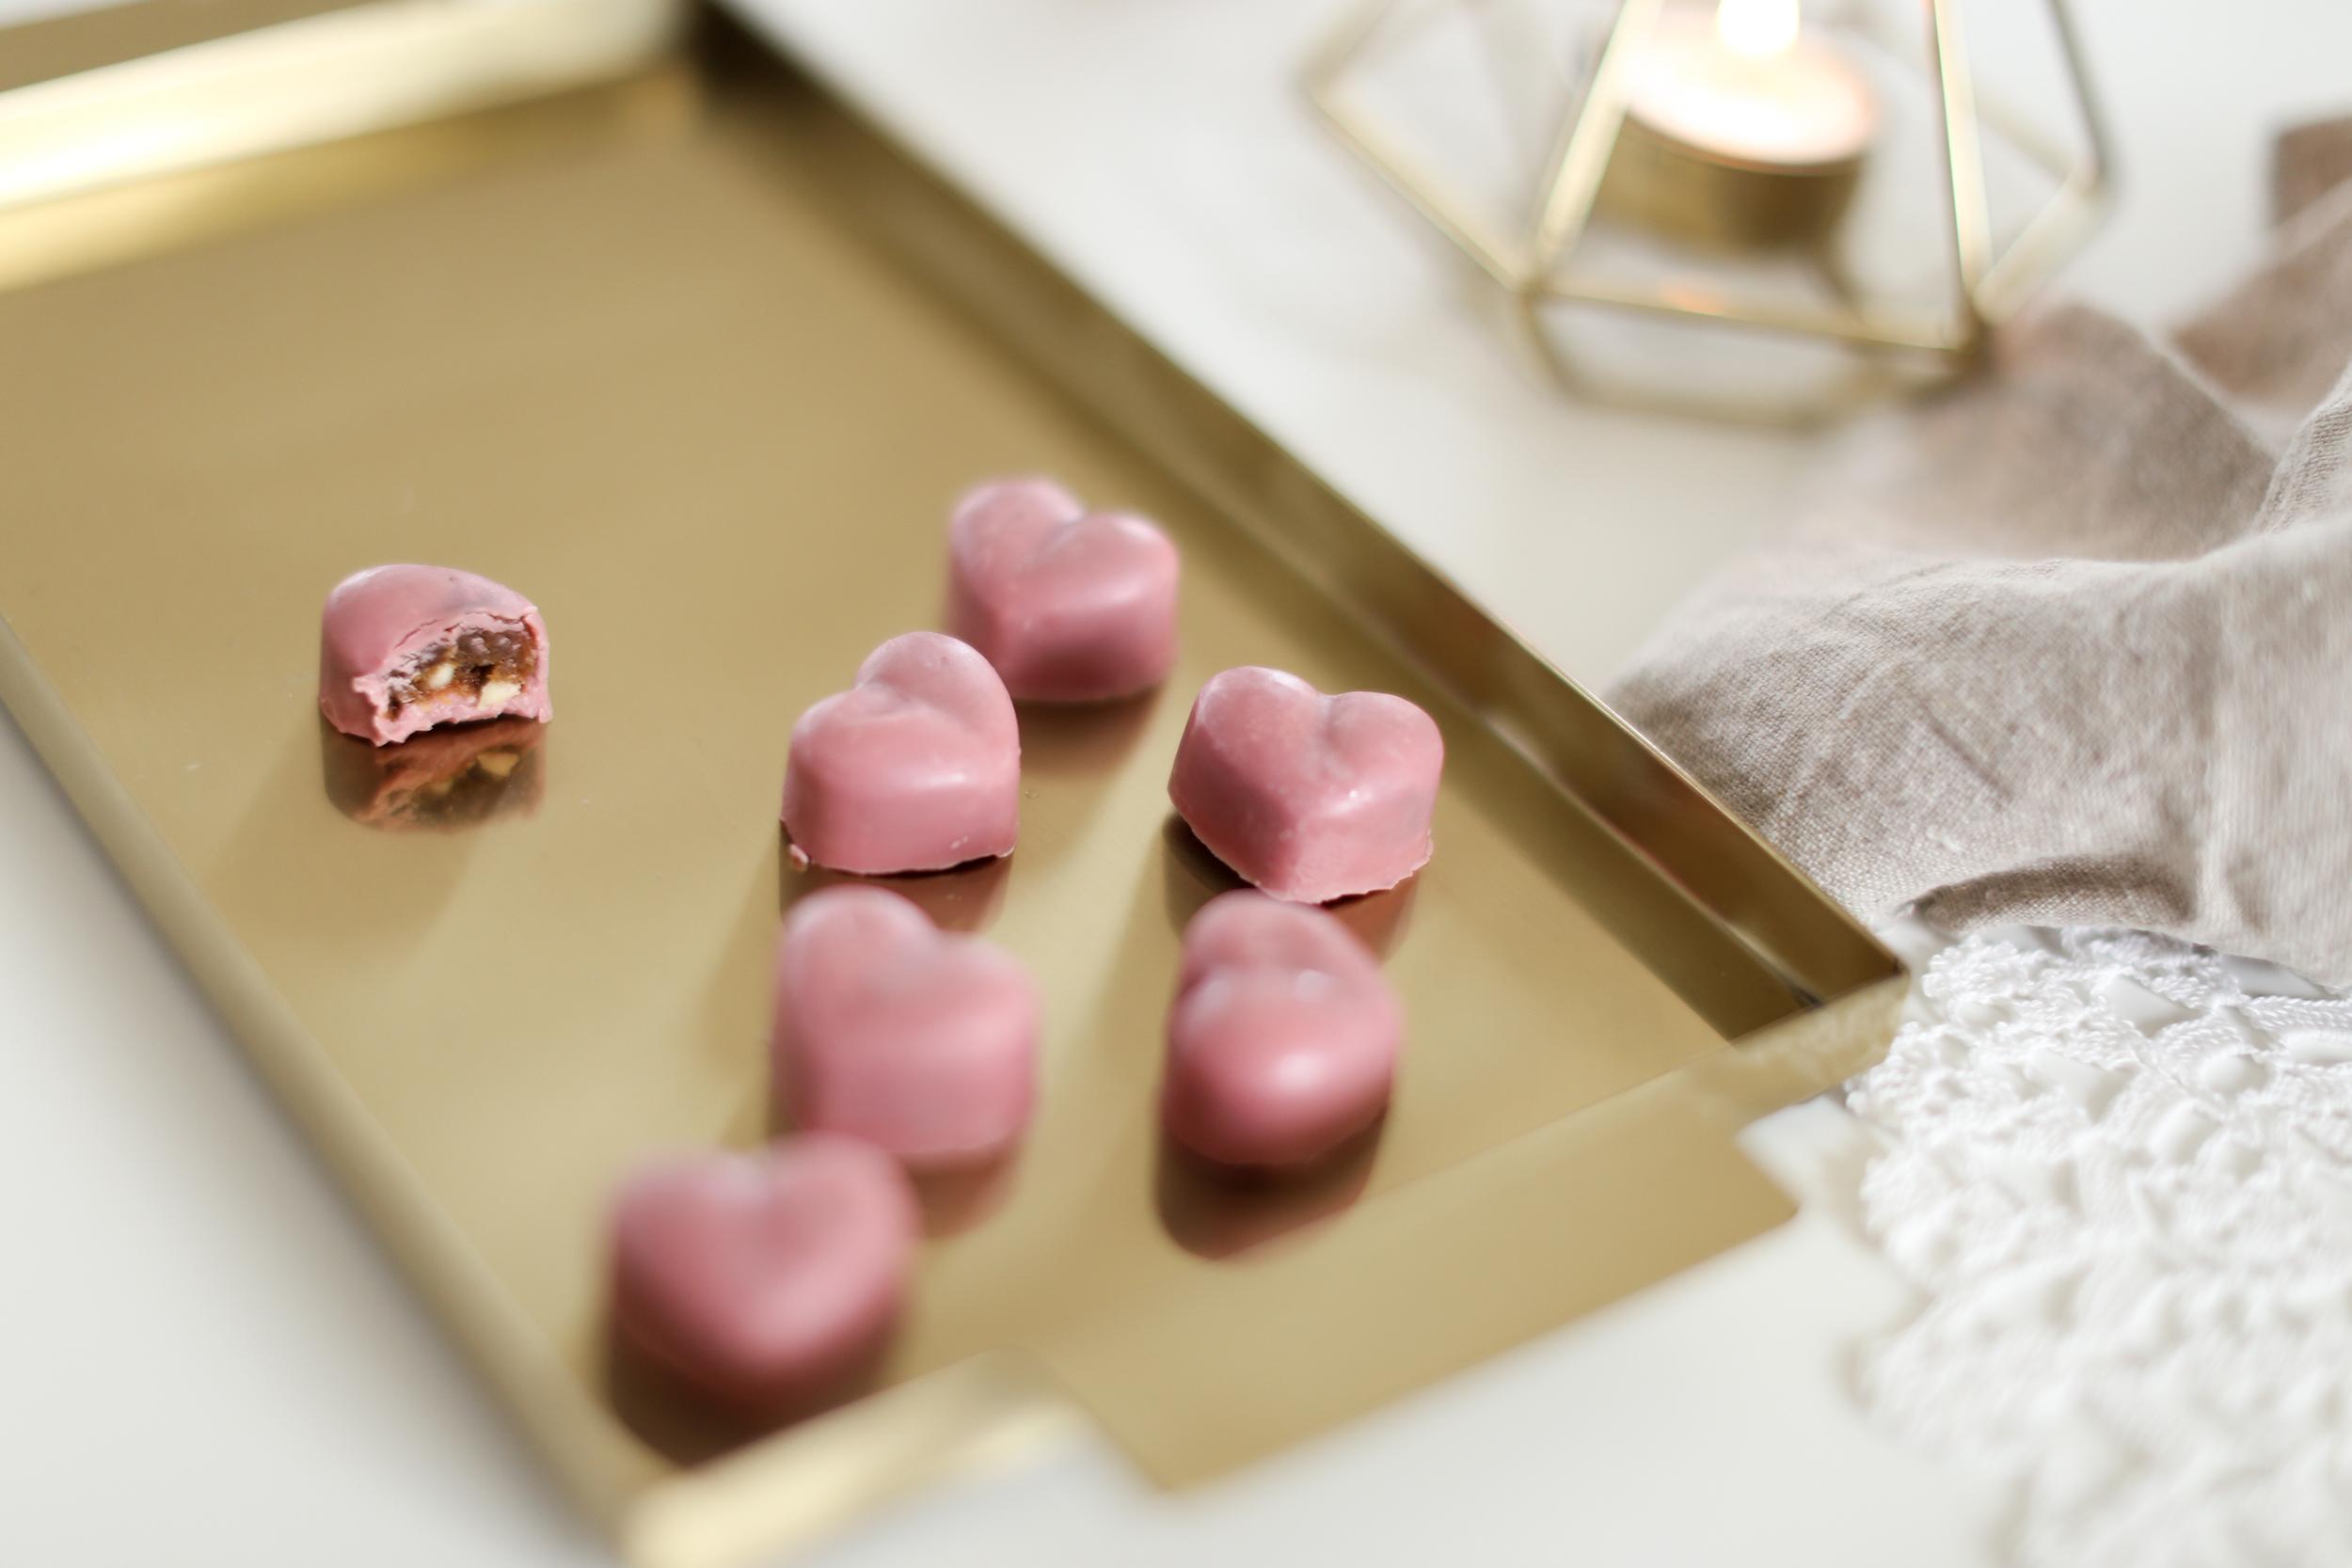 fyldte valentinschokolader med Ruby chokolade